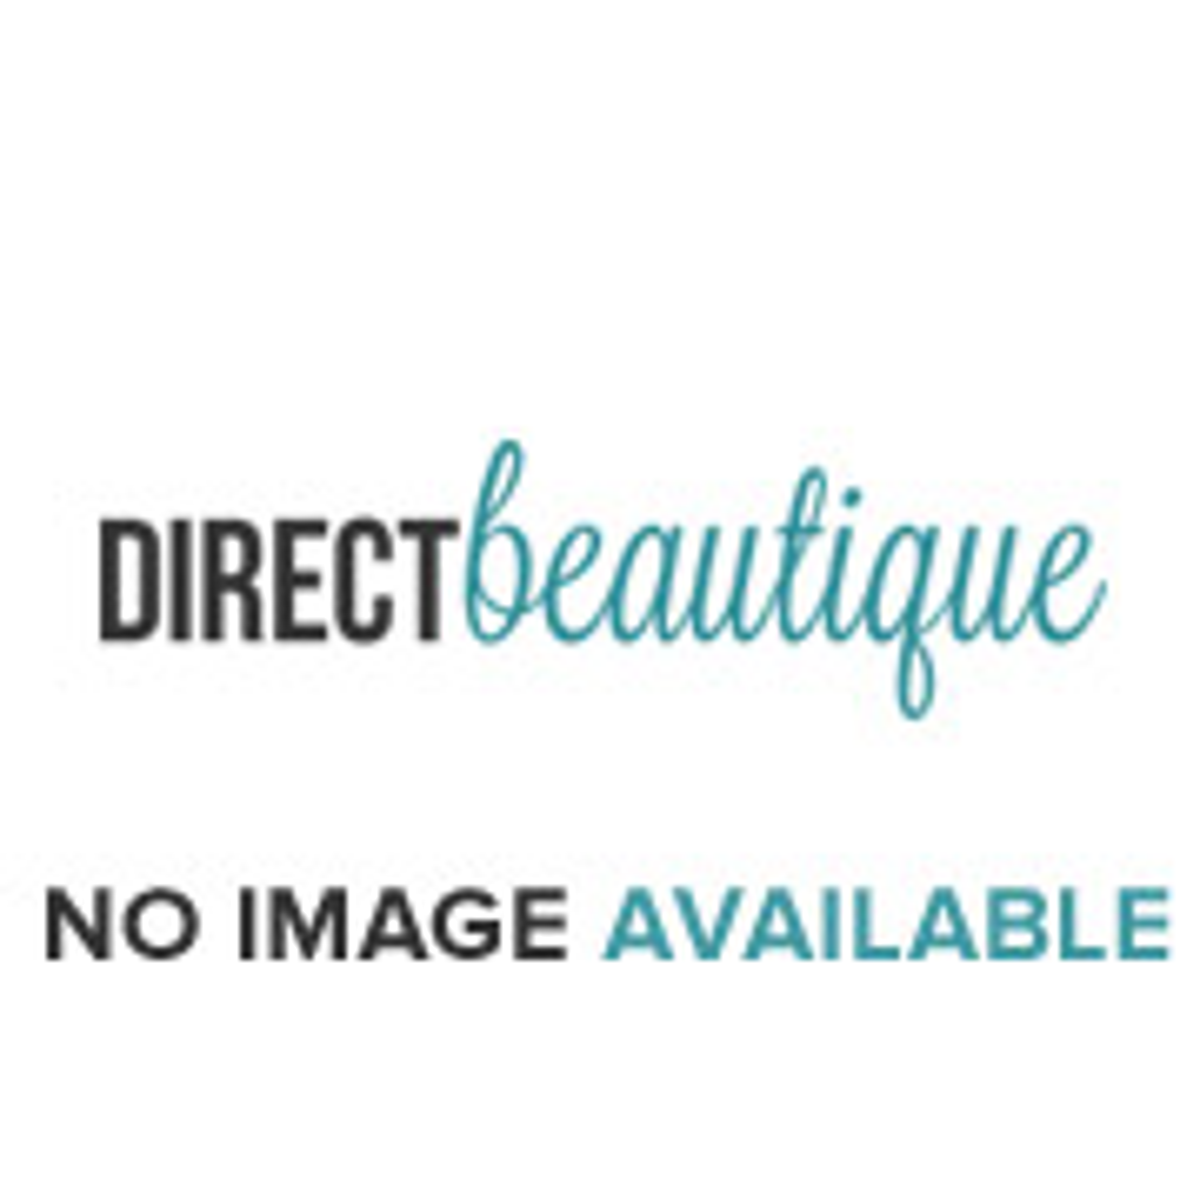 Zadig & Voltaire Zadig Et Voltaire This Is Him! EDT Spray 30ml